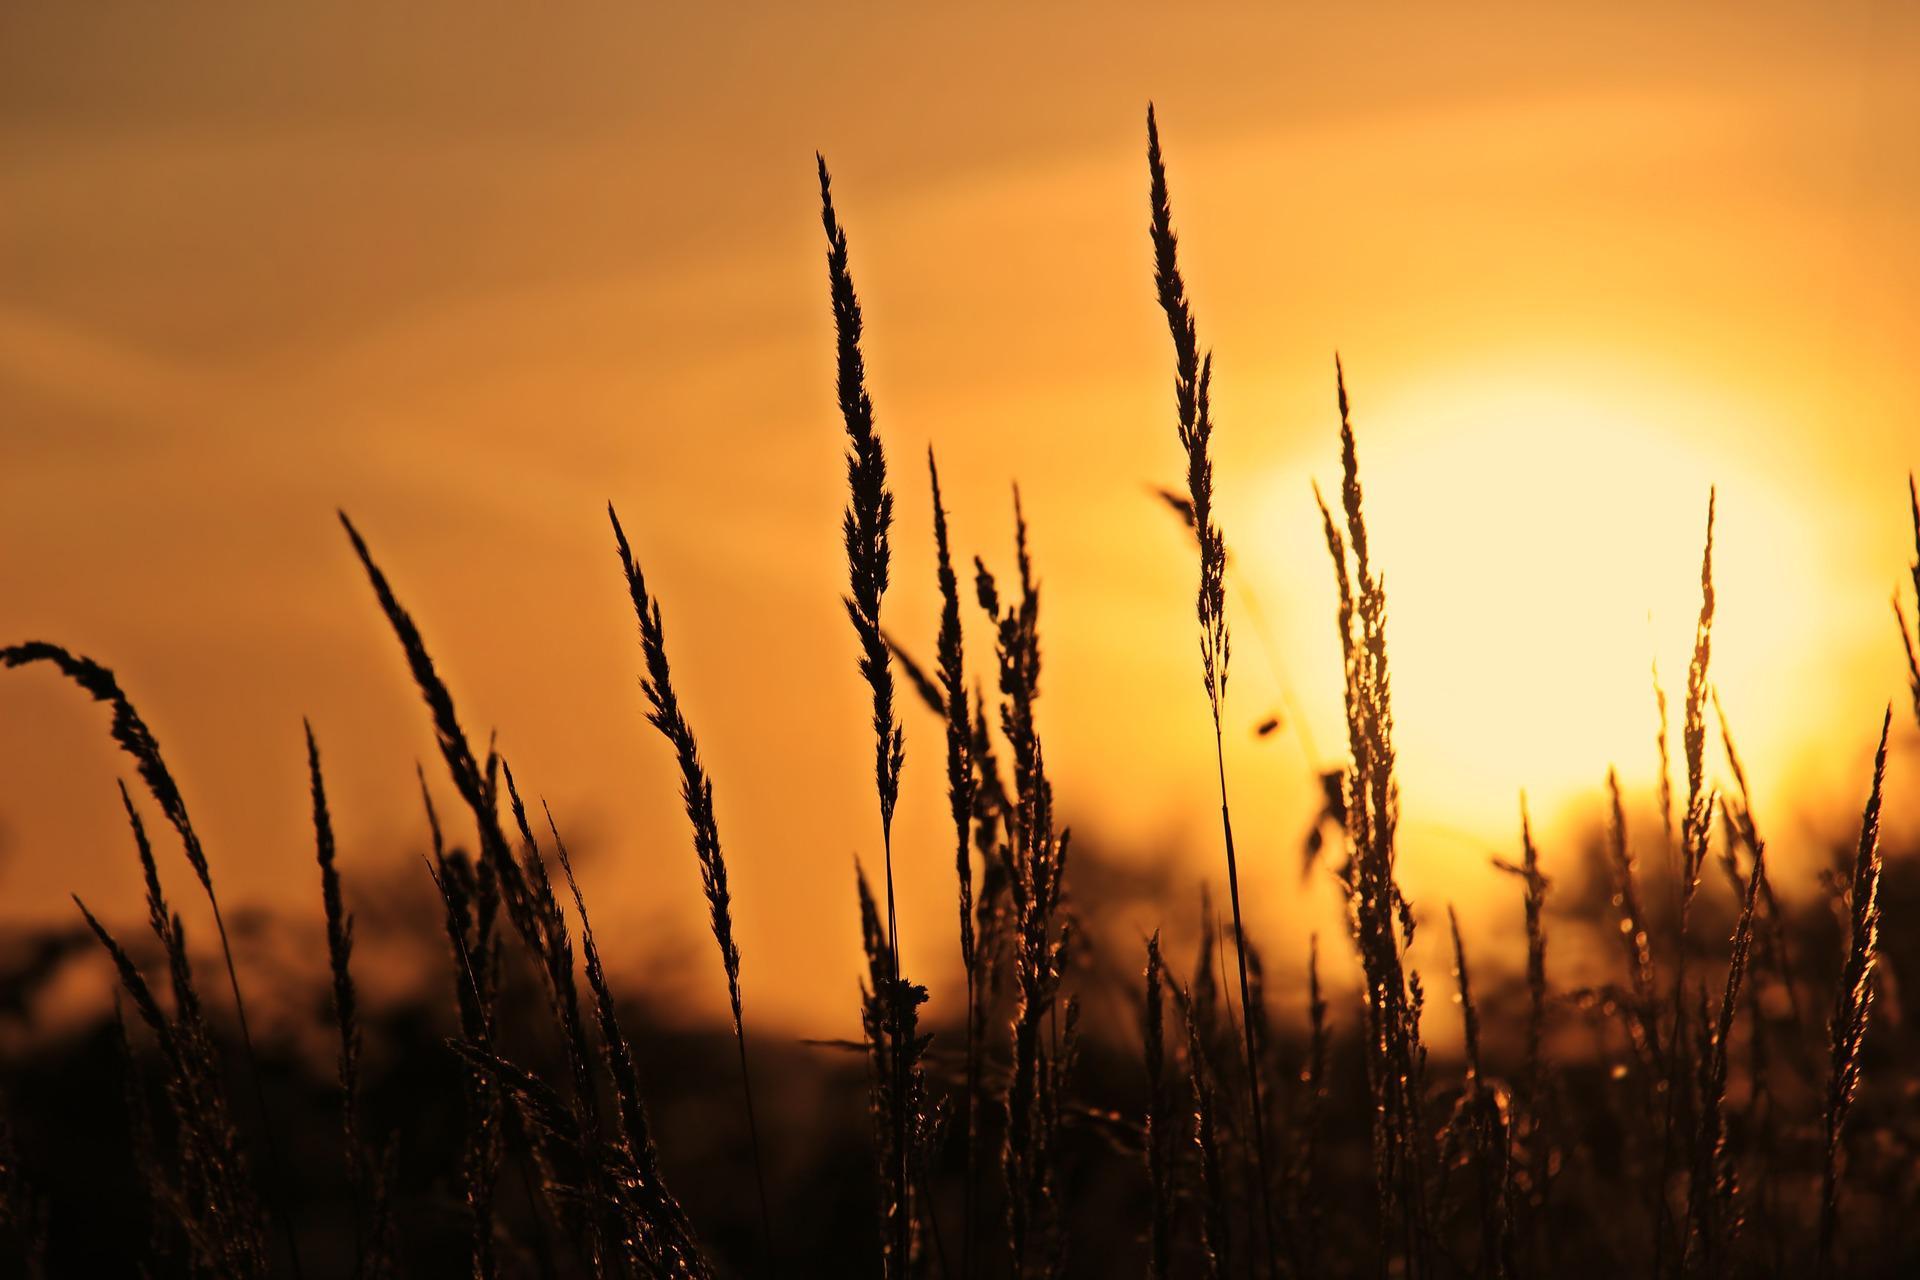 Centro-Oeste: confira as tendências do tempo para inverno e primavera